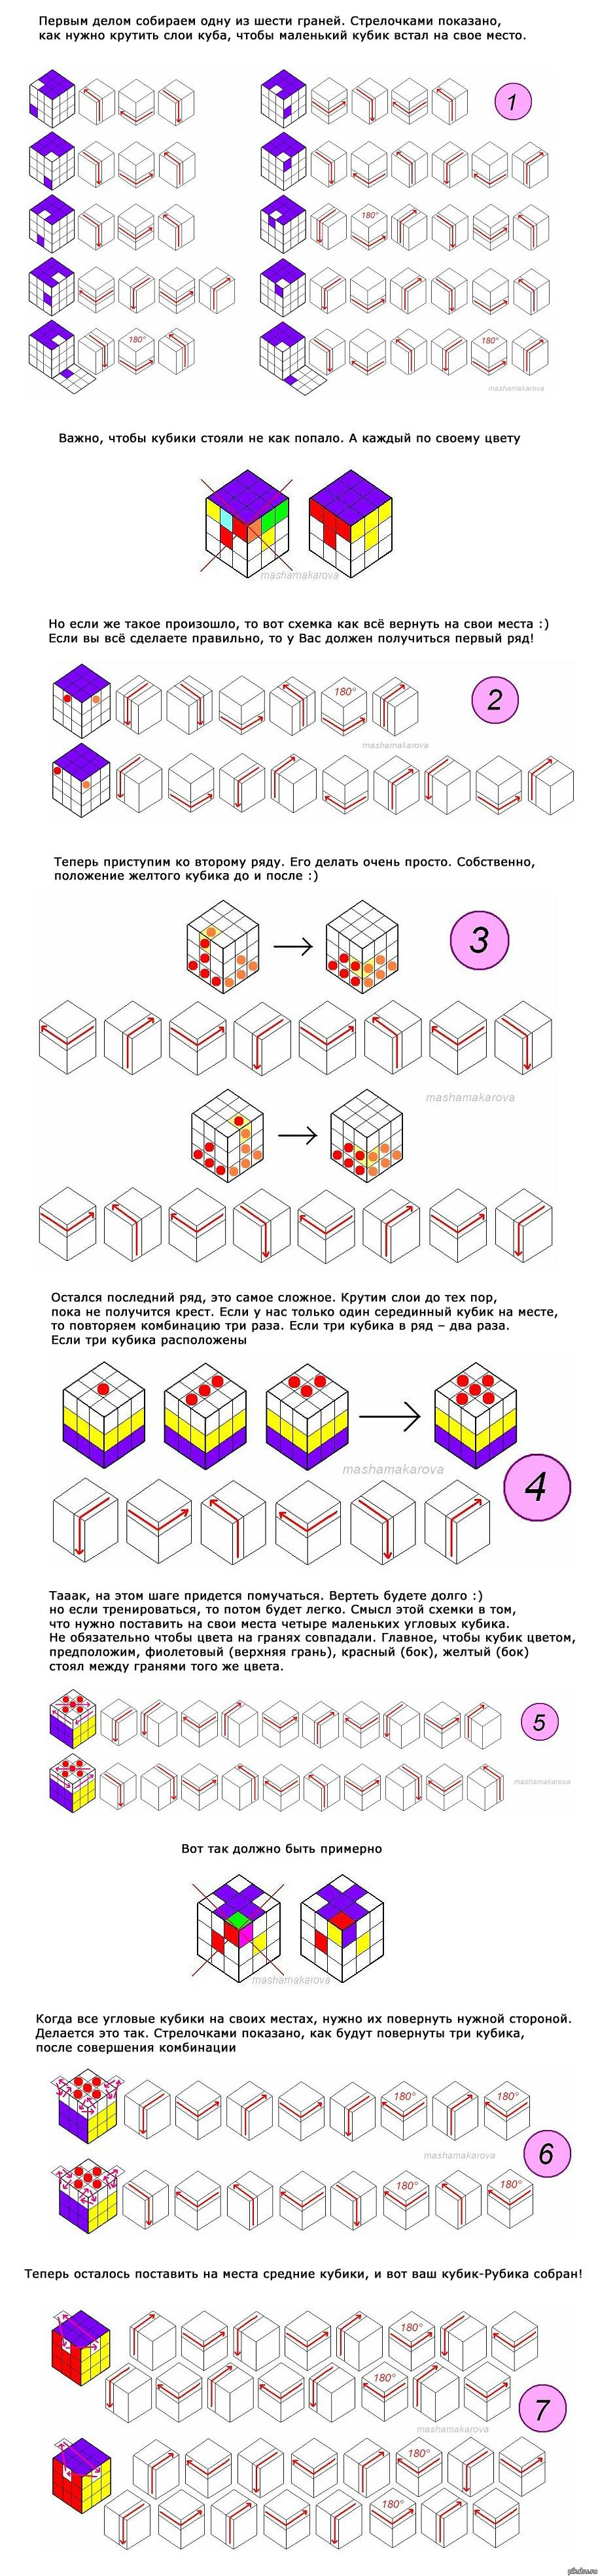 схема сборки кубика рубика белорусская